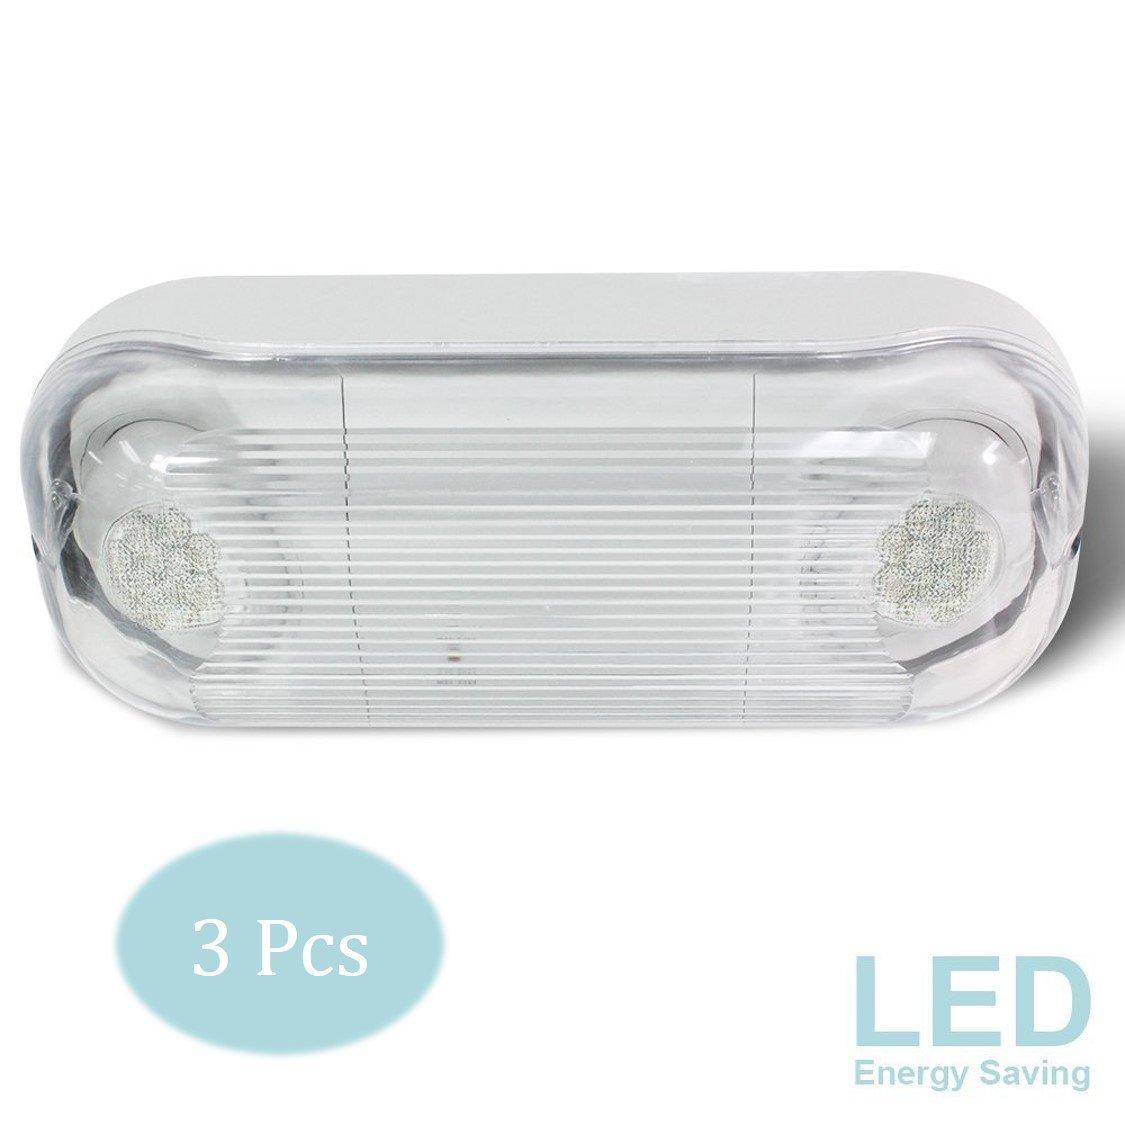 eTopLighting [3 PCS] LED Hardwired Outdoor/Indoor Emergency Light, Wet Damp Listed, Energy Saving LED Beads & Durable Body Material, Minimal Maintenance, AGG2046